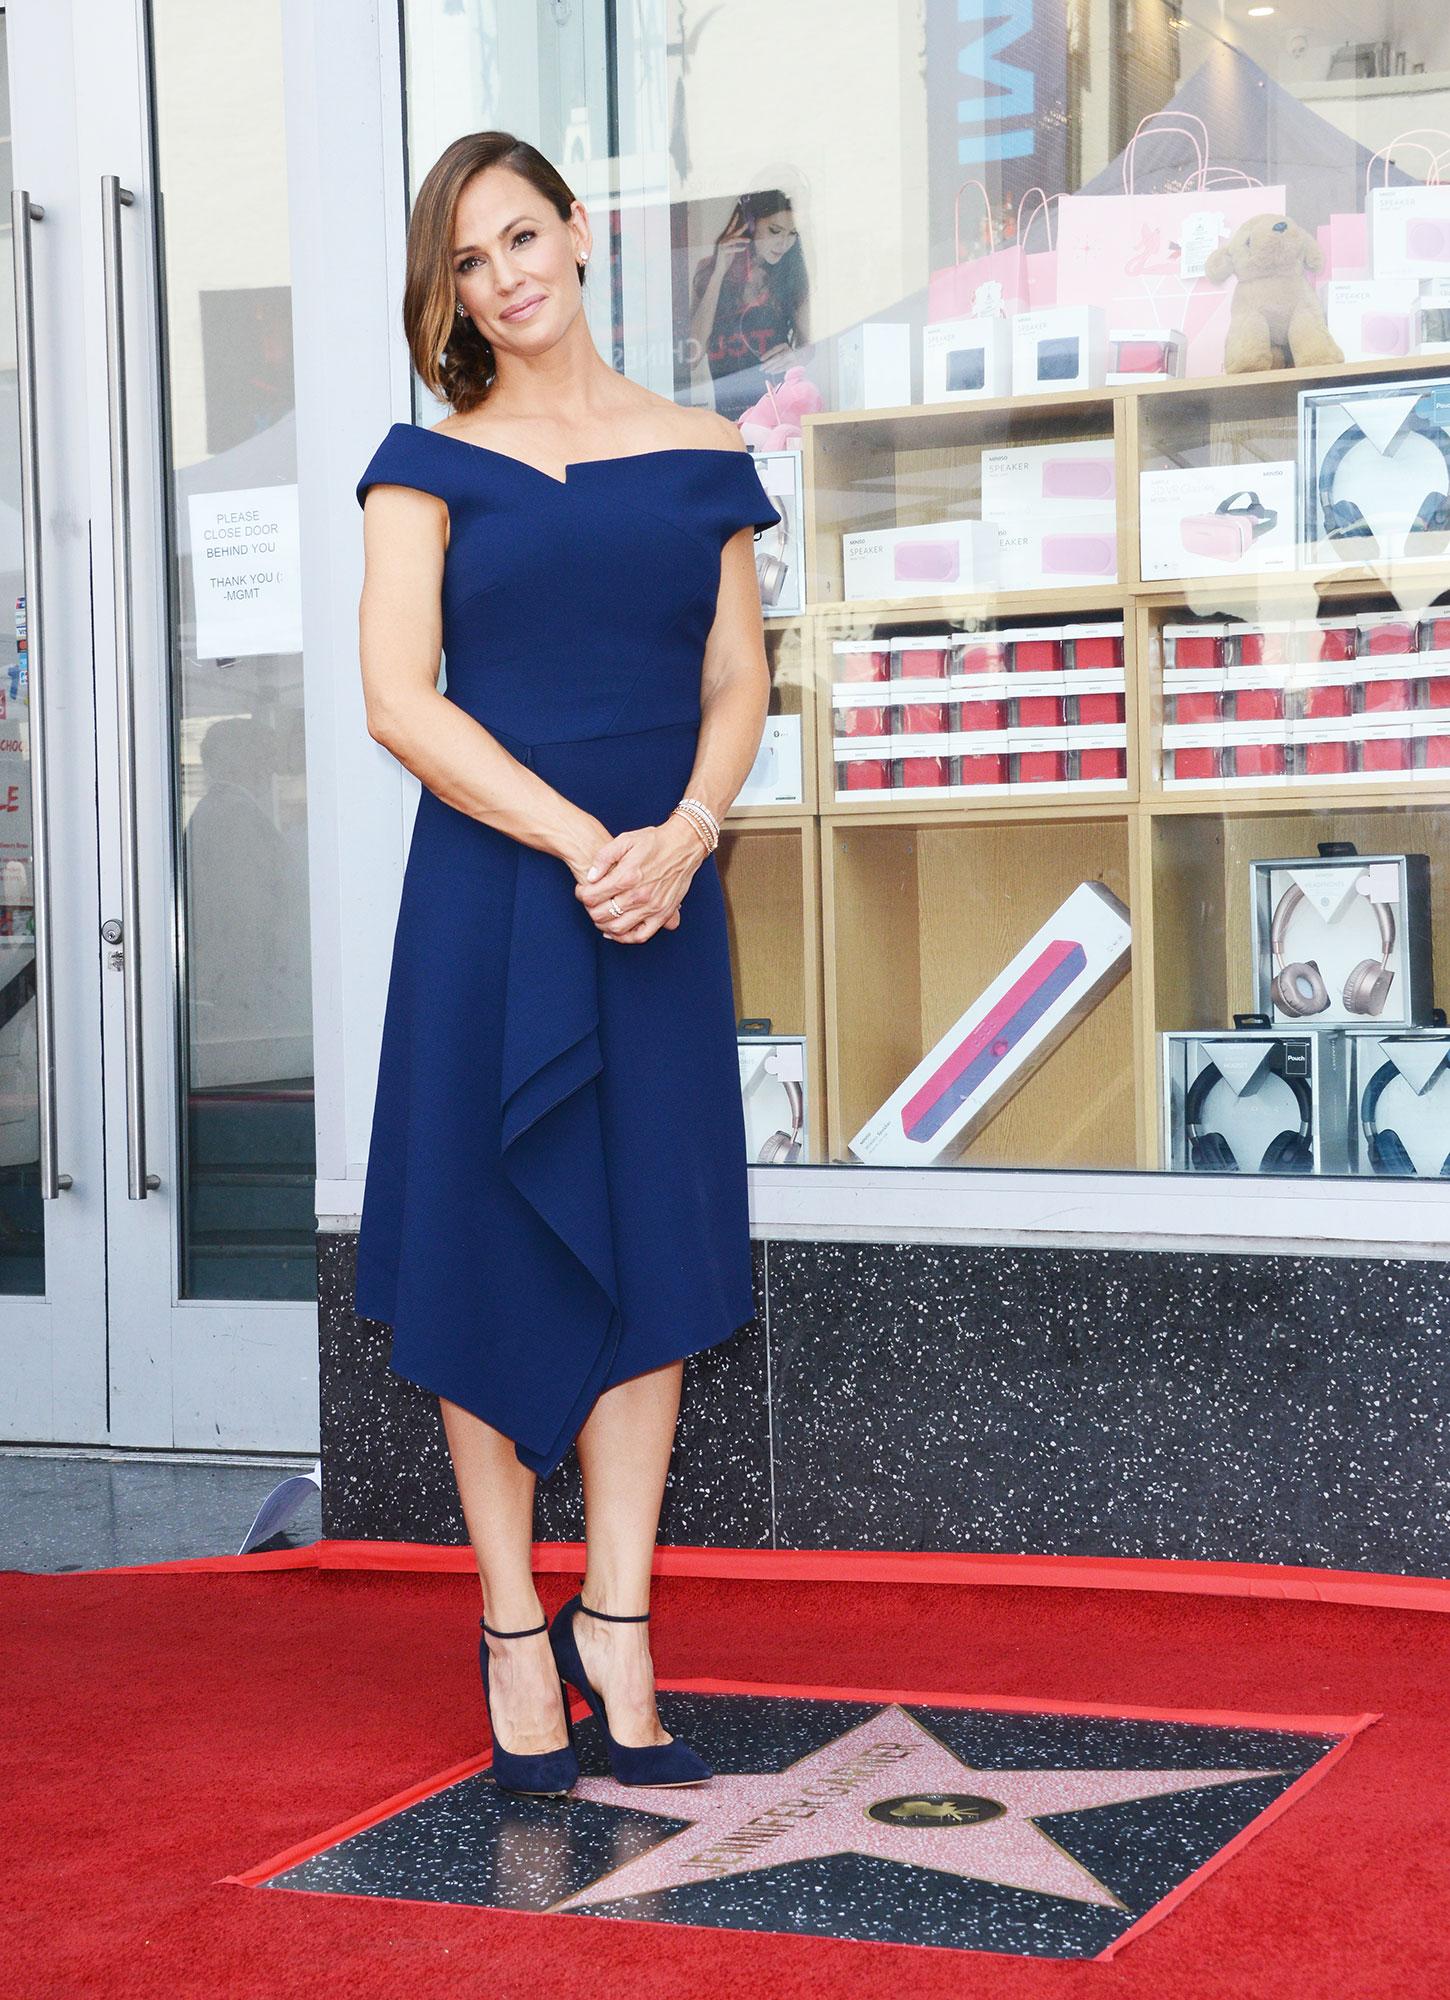 Jennifer Garner navy blue dress walk of fame hollywood - Actress Jennifer Garner Honored With Star On The Hollywood Walk Of Fame held on August 20, 2018 in Hollywood, California.